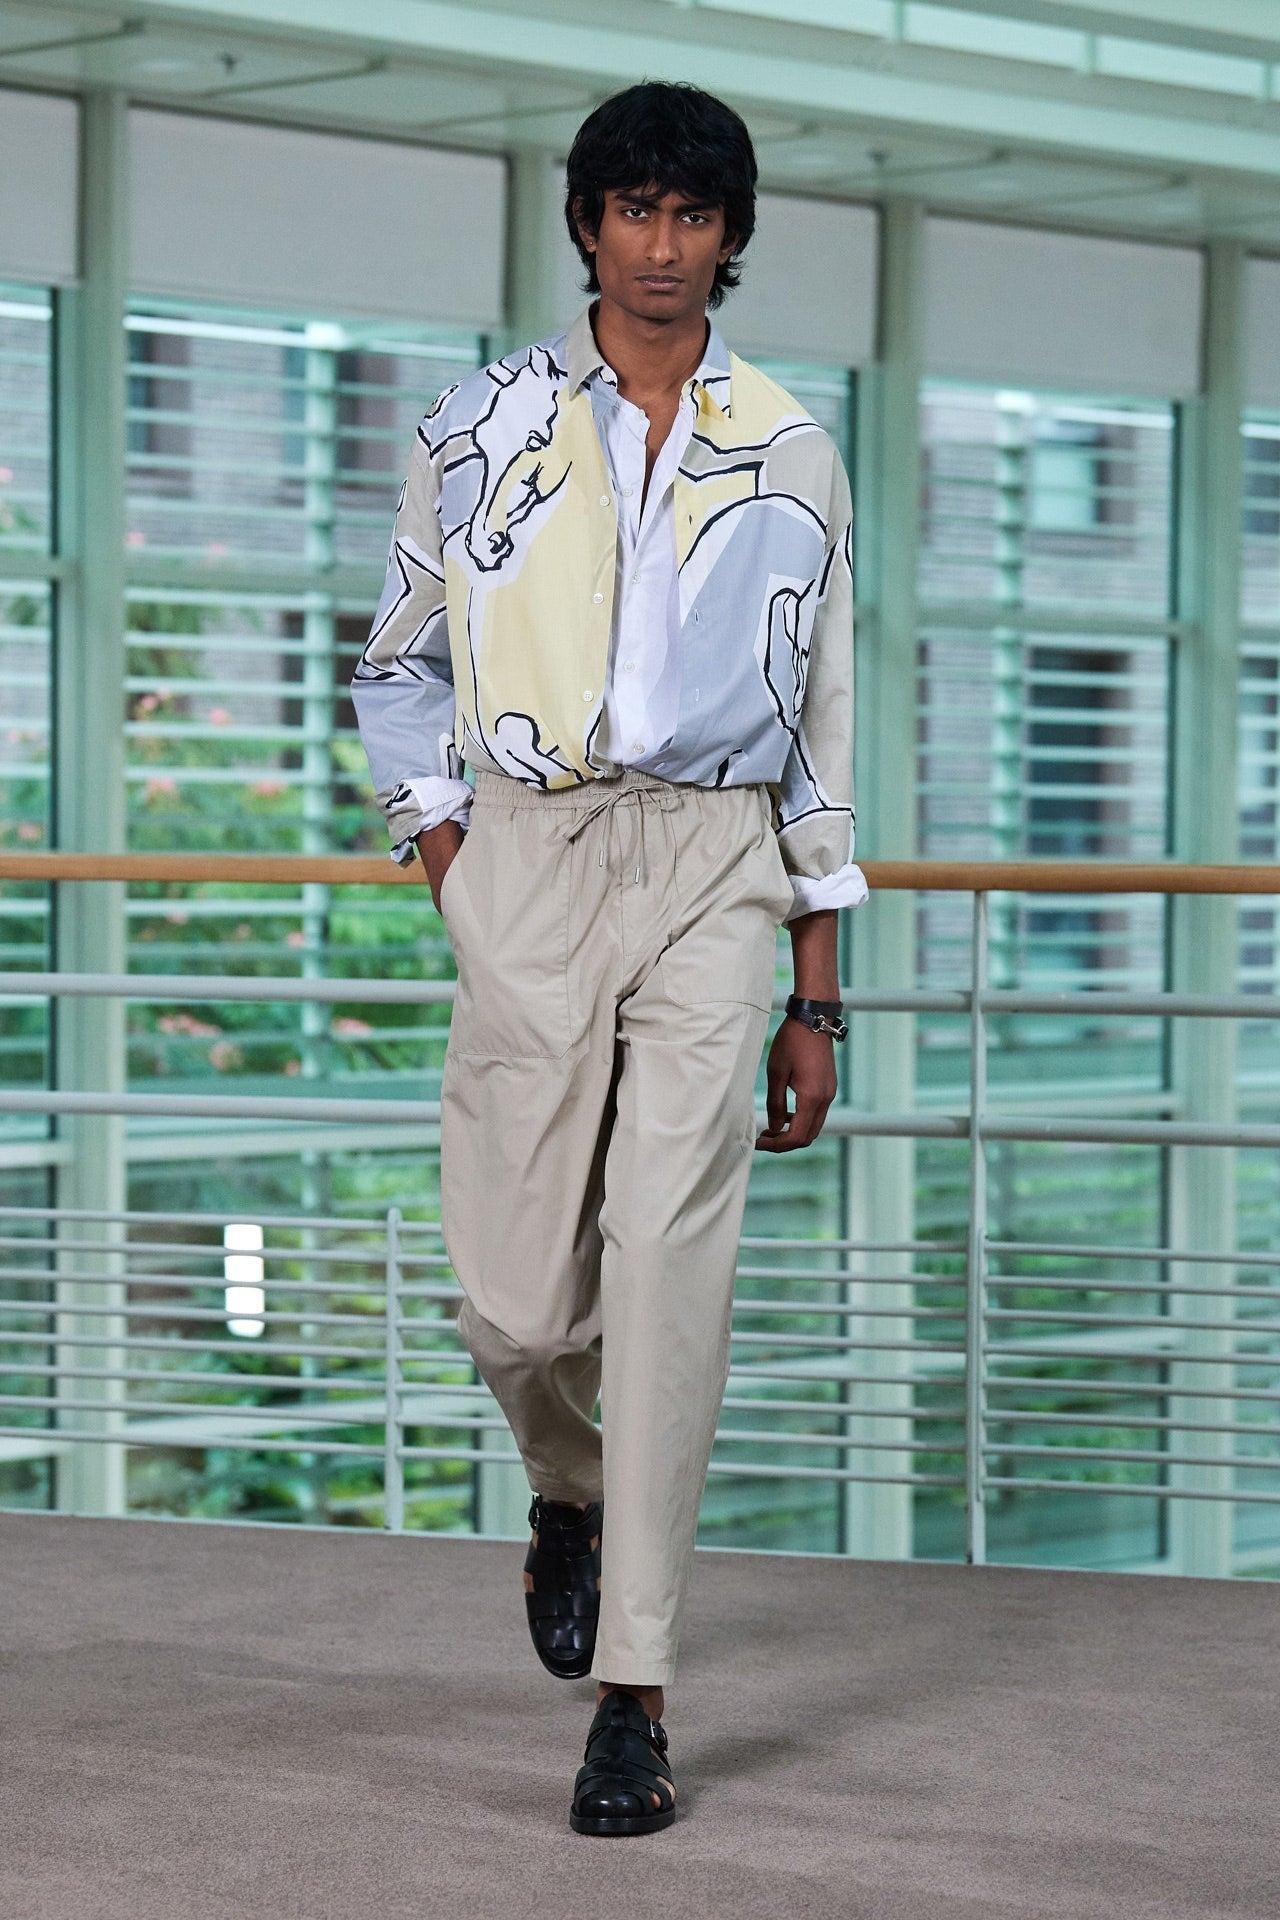 Hermès Spring-Summer 2021 Autor: Filippo Fior / Courtesy of Hermès